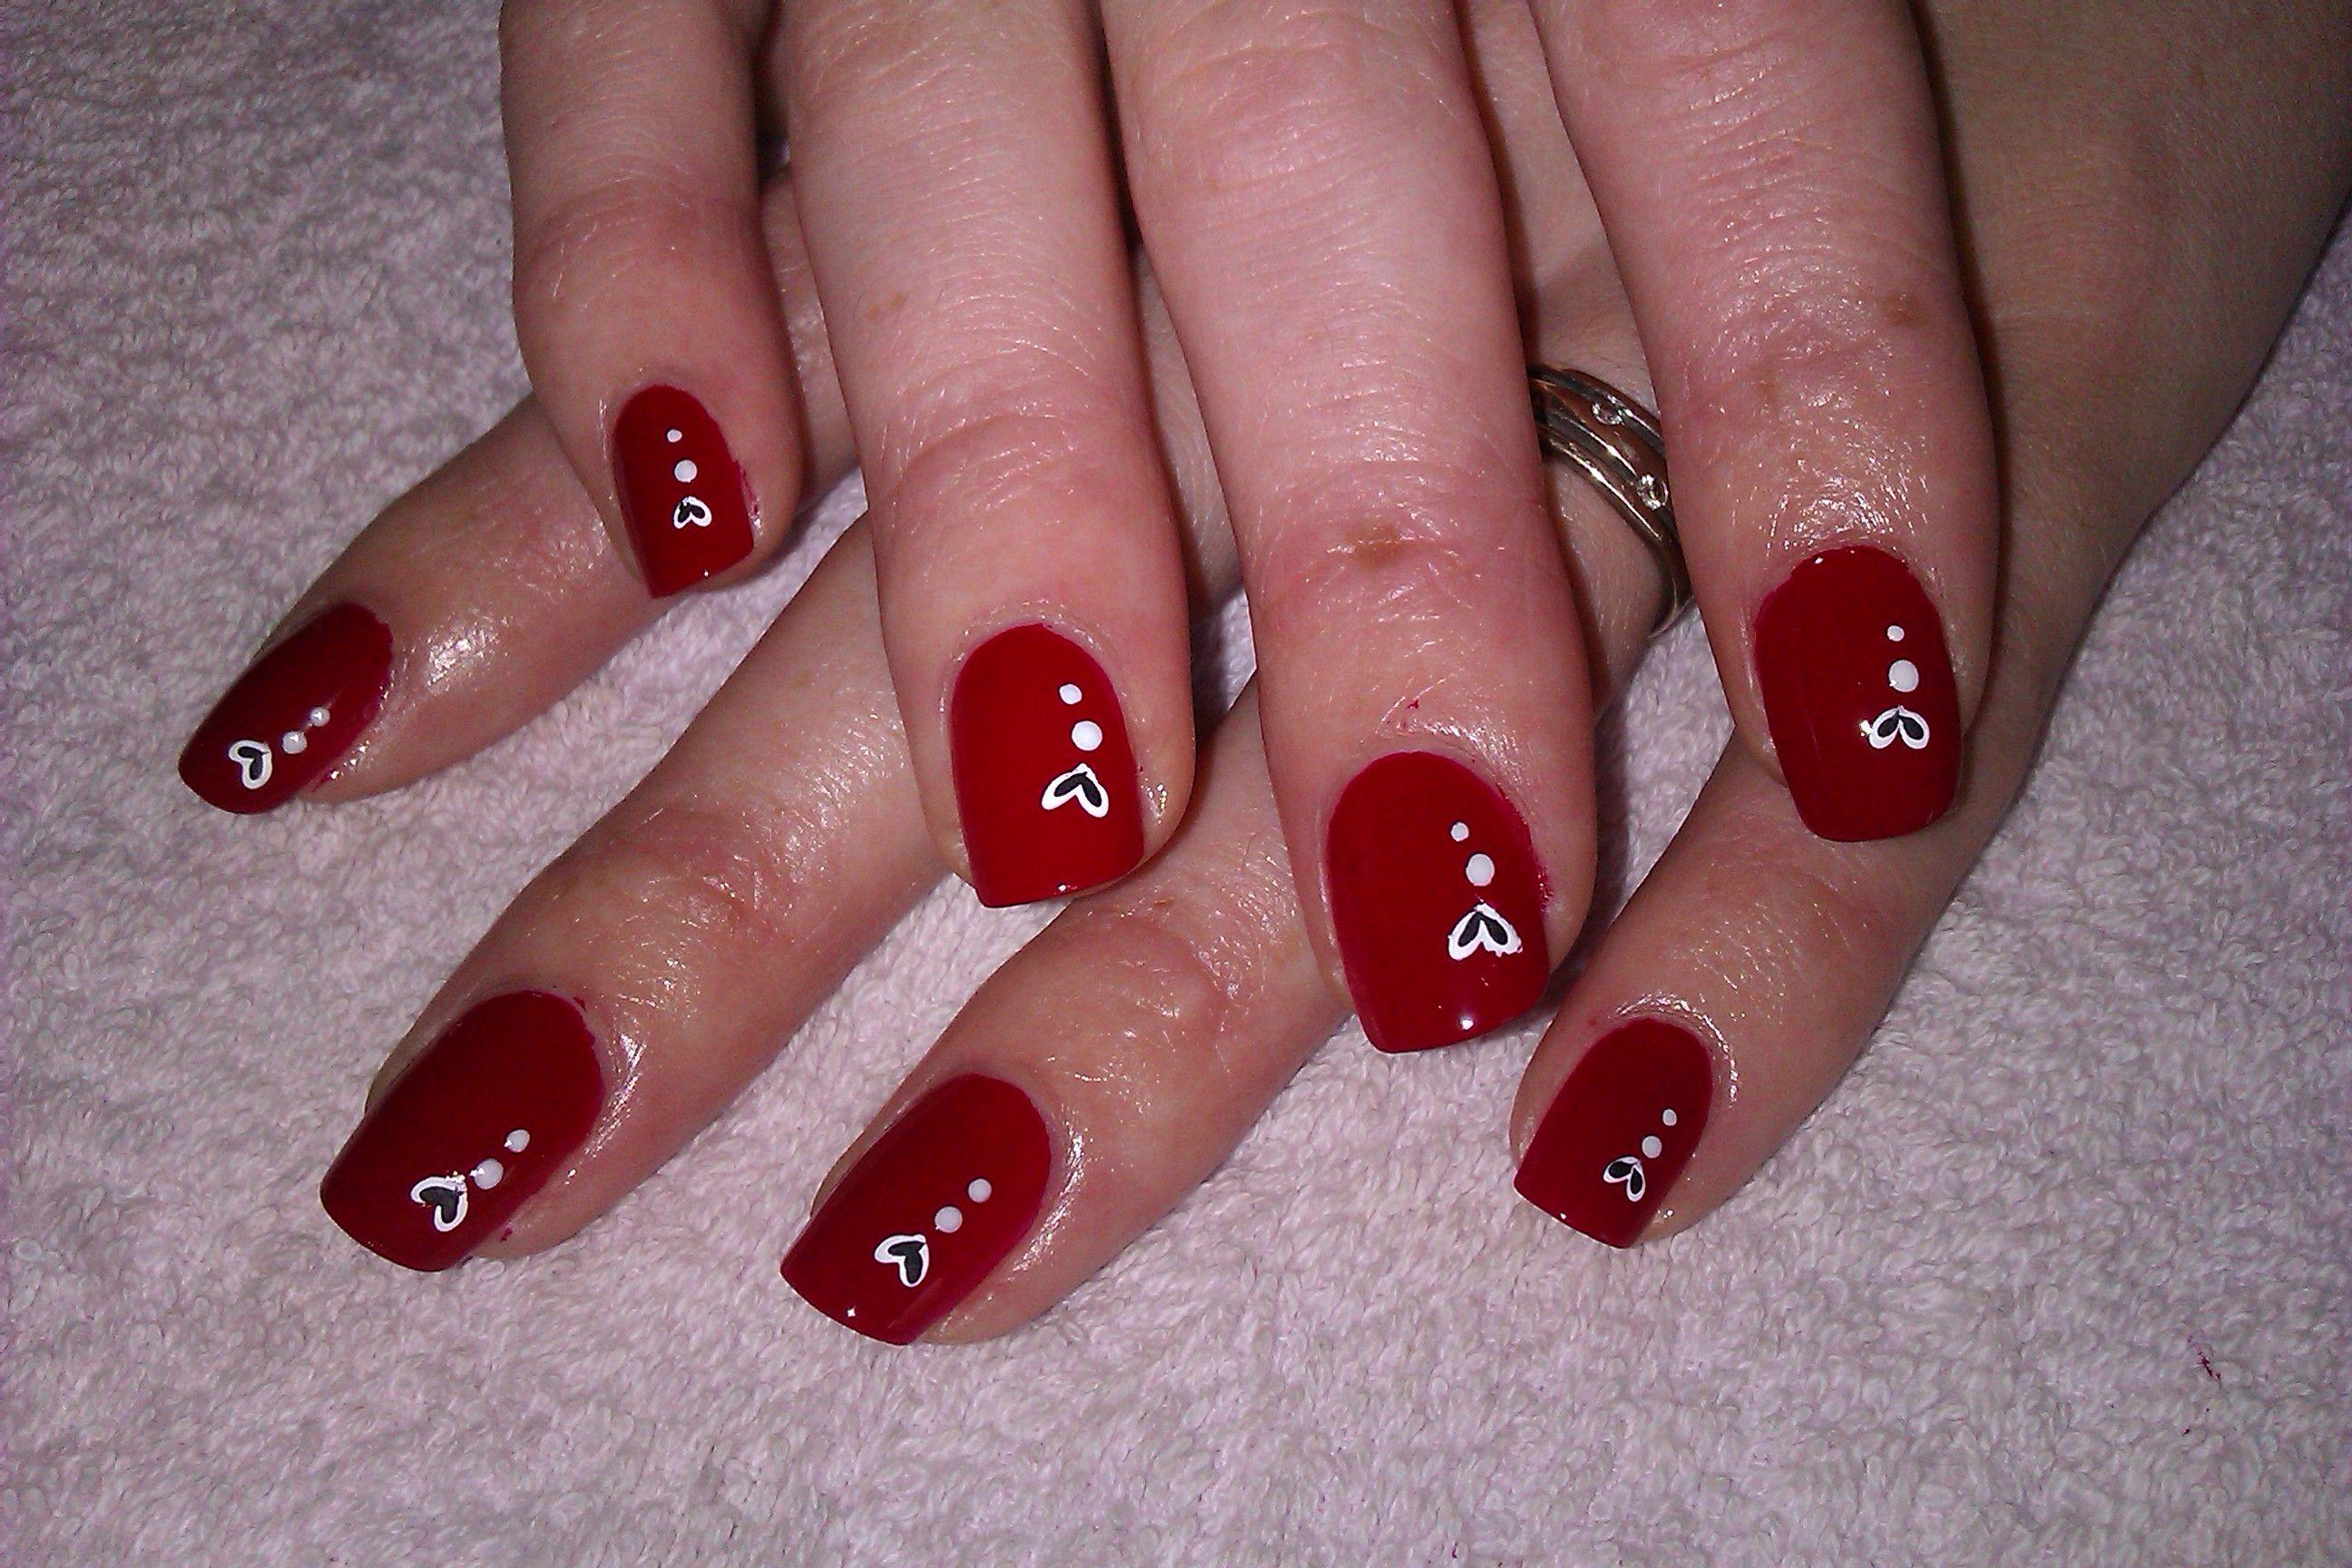 4 Diy Nail Art Designs Simple And Easy Red Nail Ideas For Beginners Wedding Nail Art Design Bridal Nail Art Nail Designs Valentines